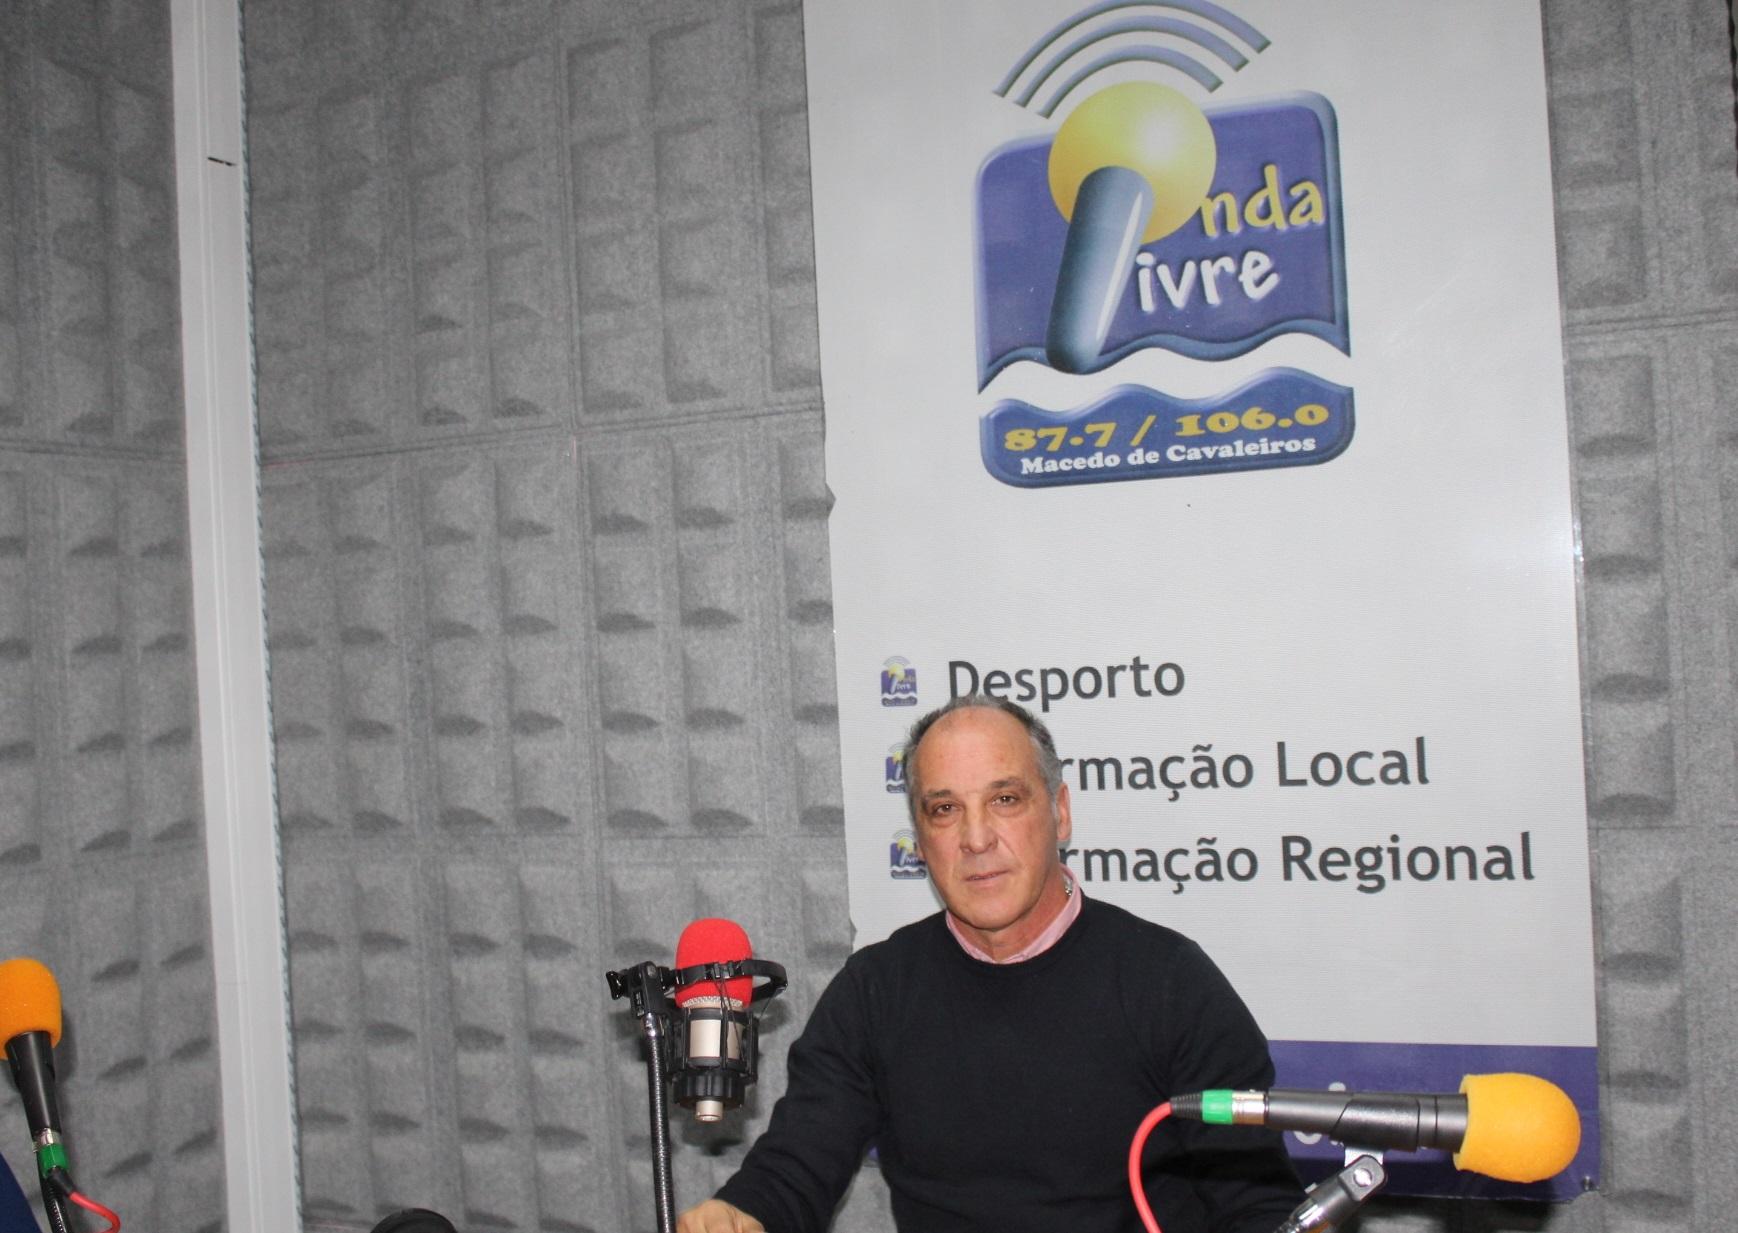 José Carlos Afonso dá entrevista alargada à Rádio Onda Livre